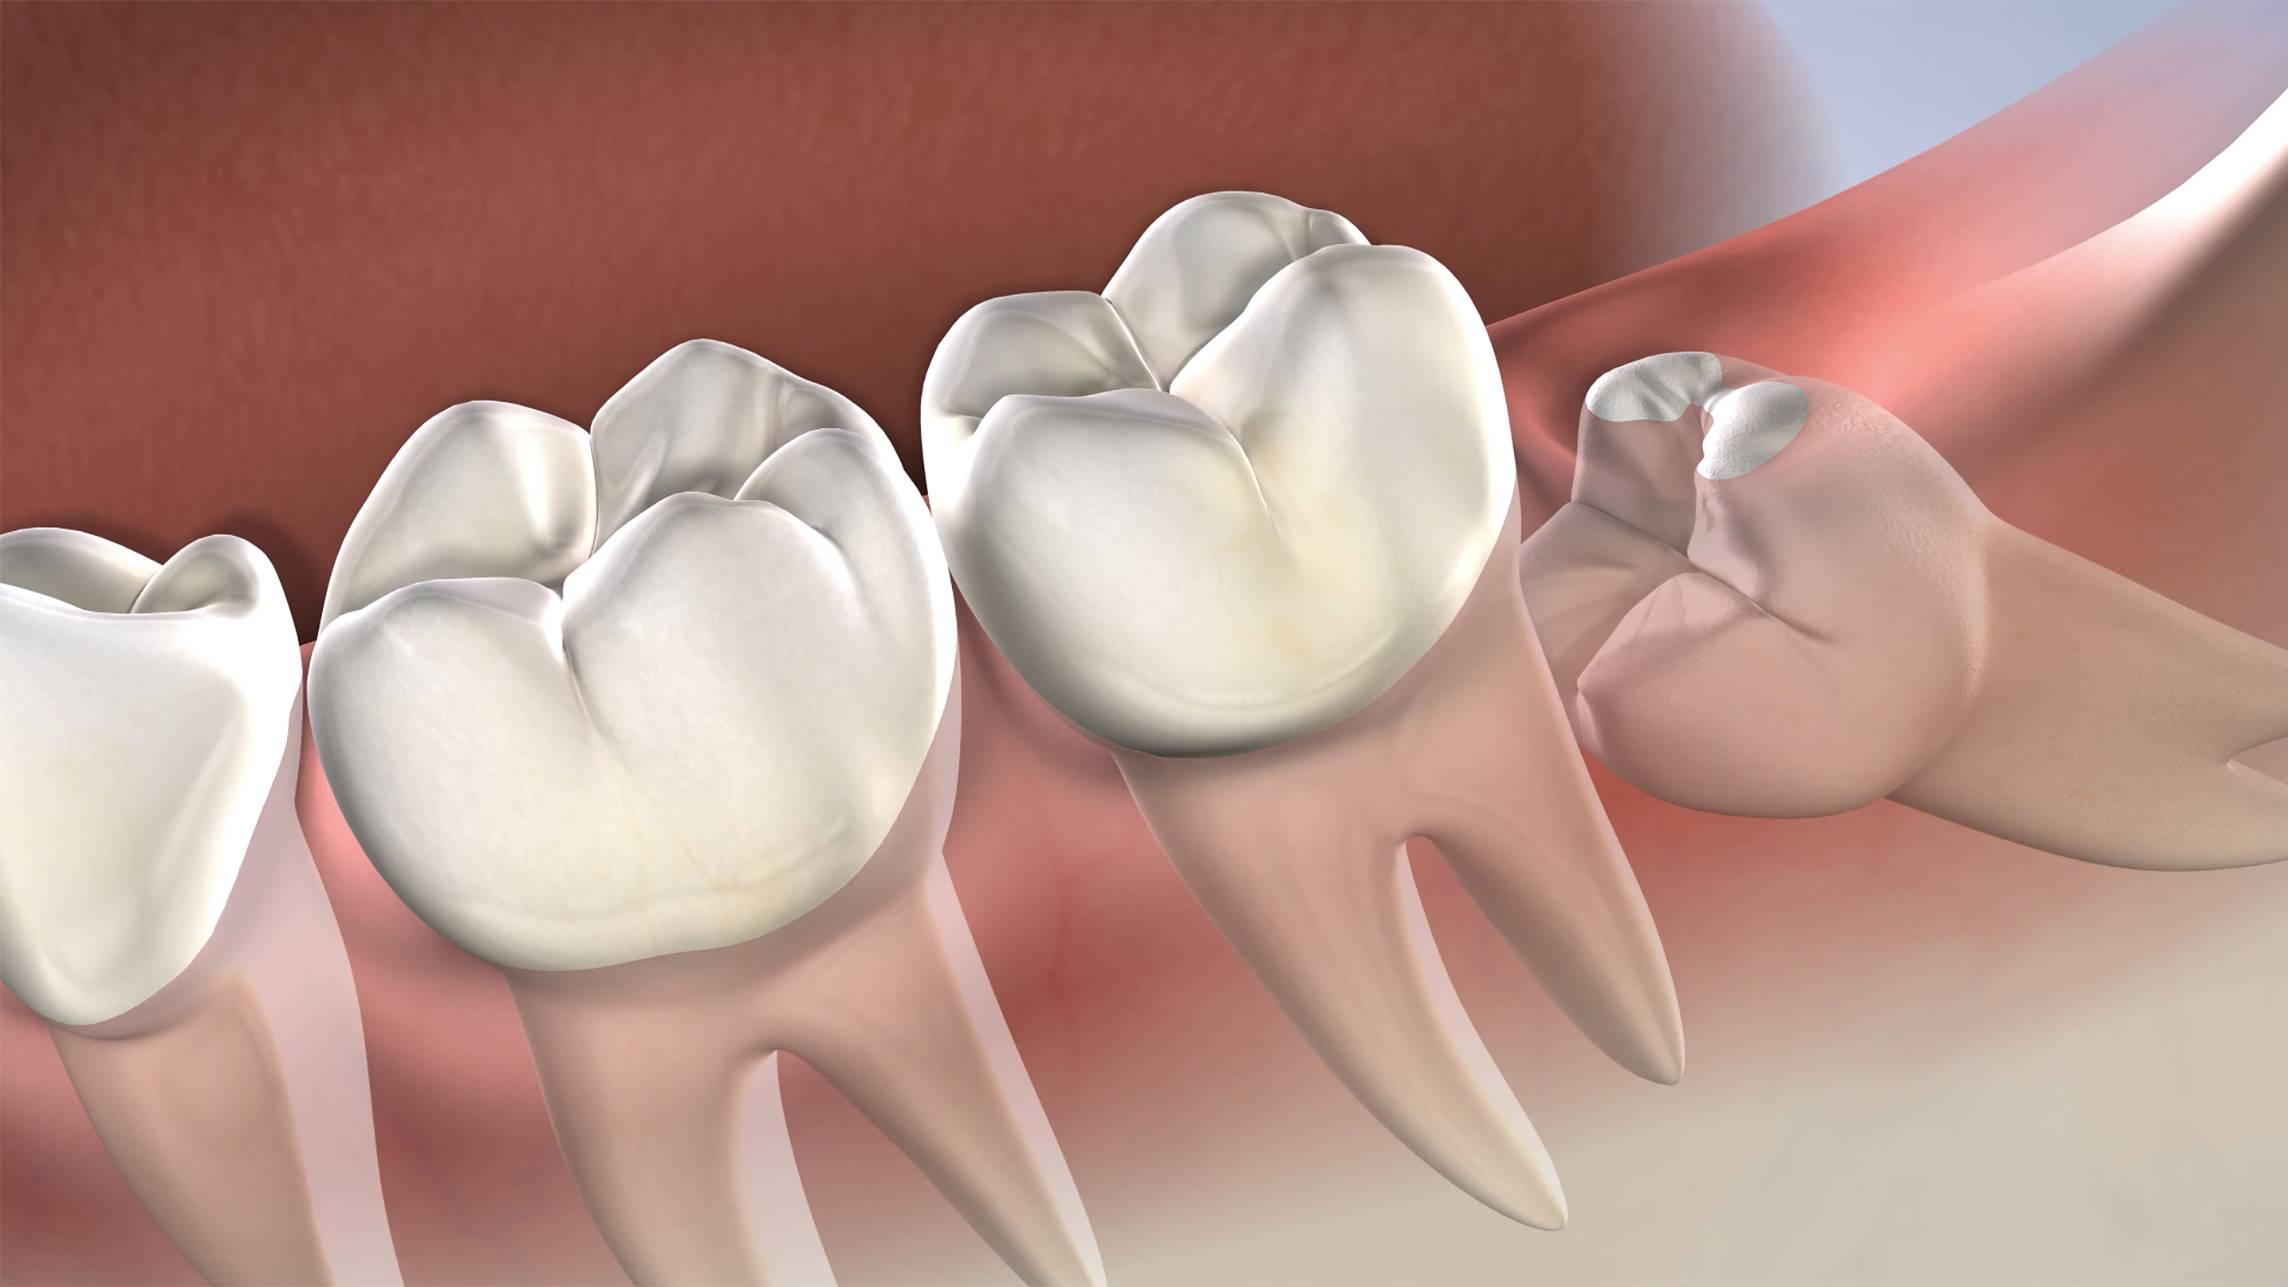 Wisdom teeth removal Procedure in Sydney